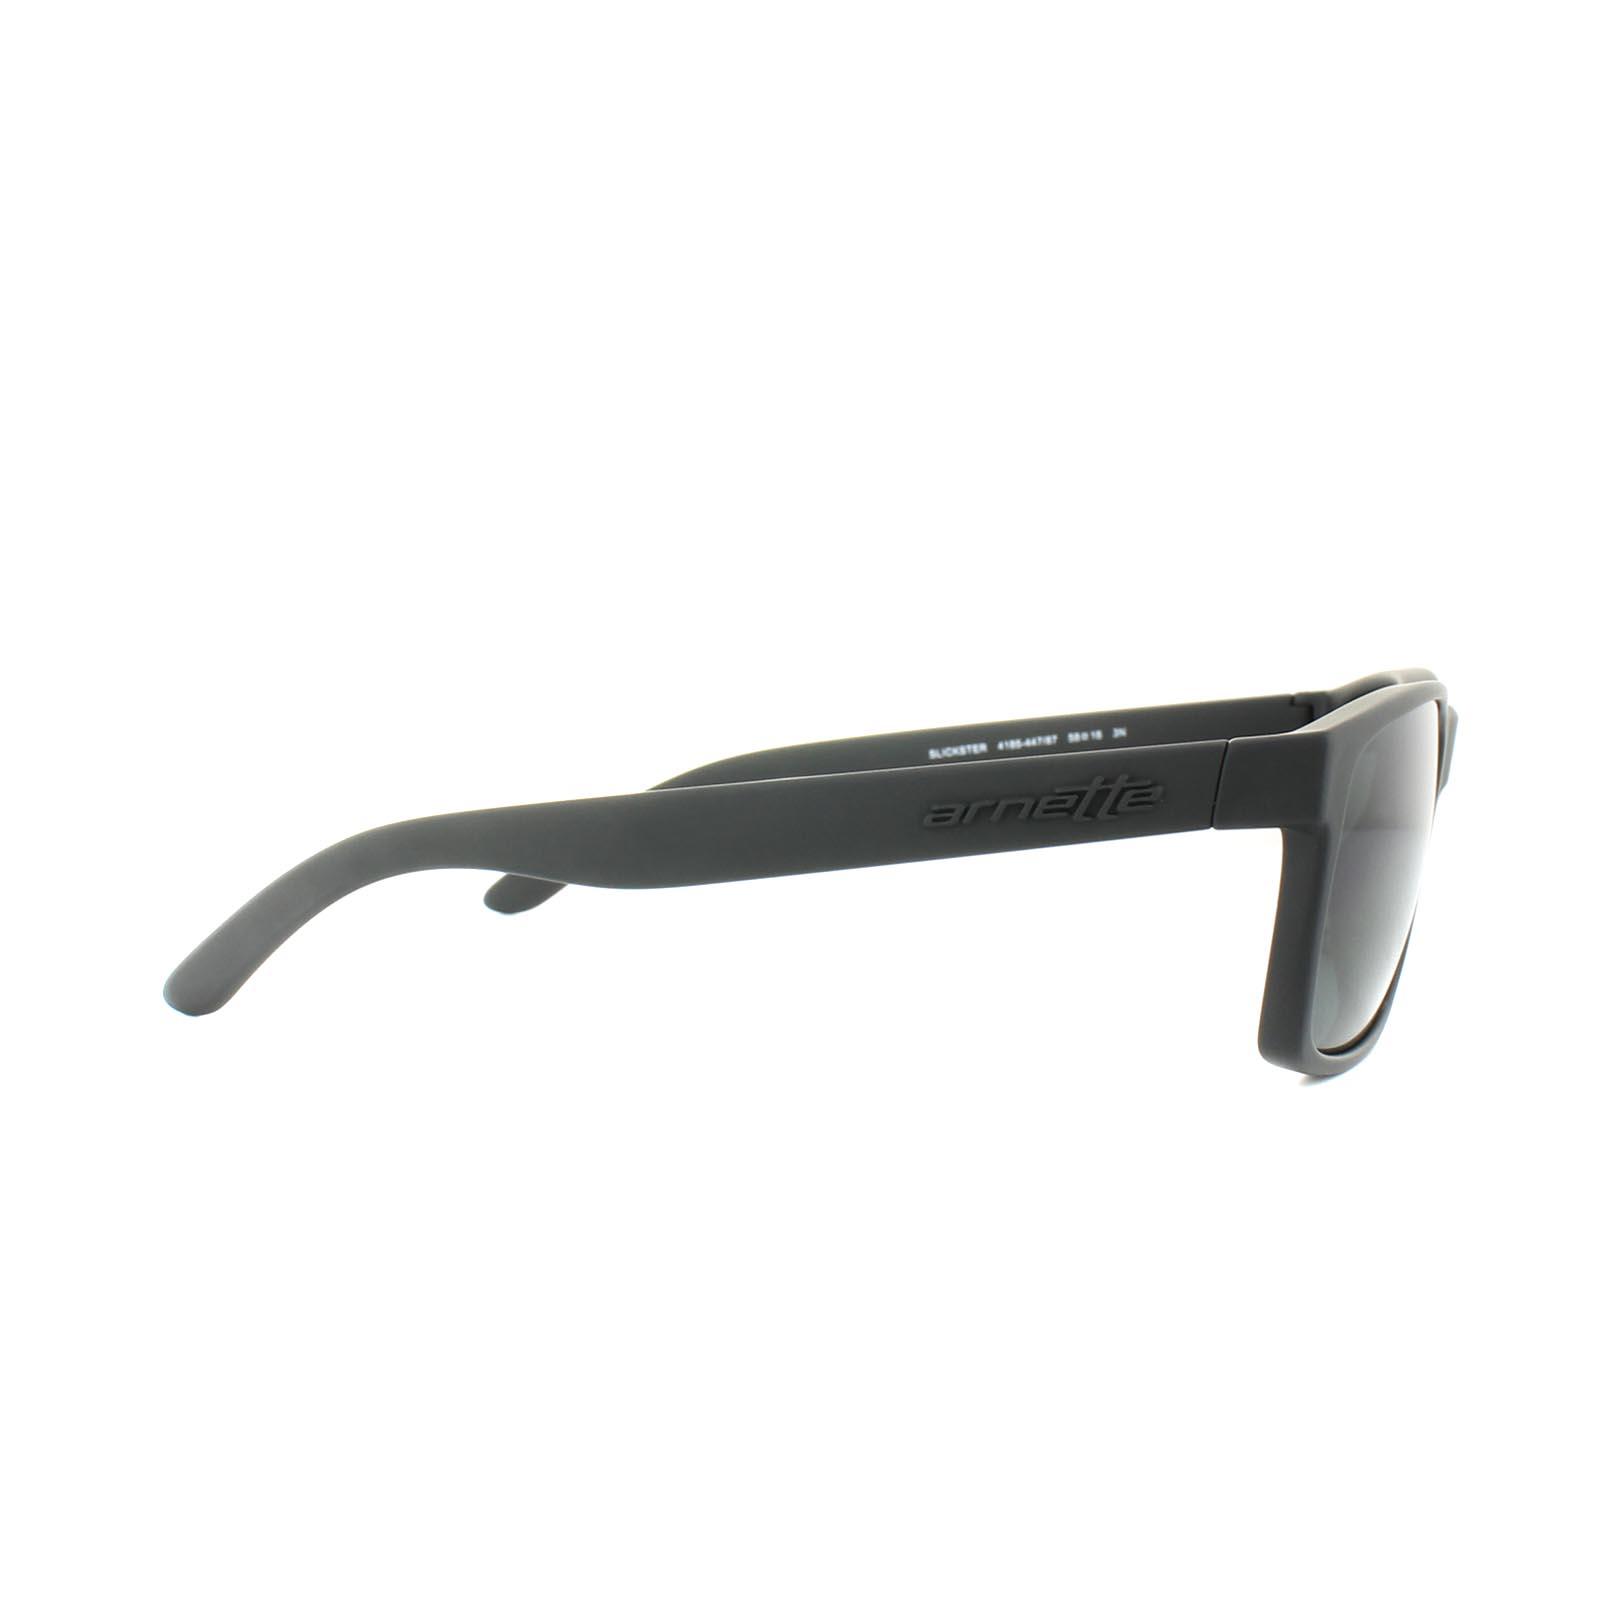 92dcc2a9a1 Sentinel Thumbnail 4. Sentinel Arnette Sunglasses Slickster 4185 447 87  Black Rubber Grey